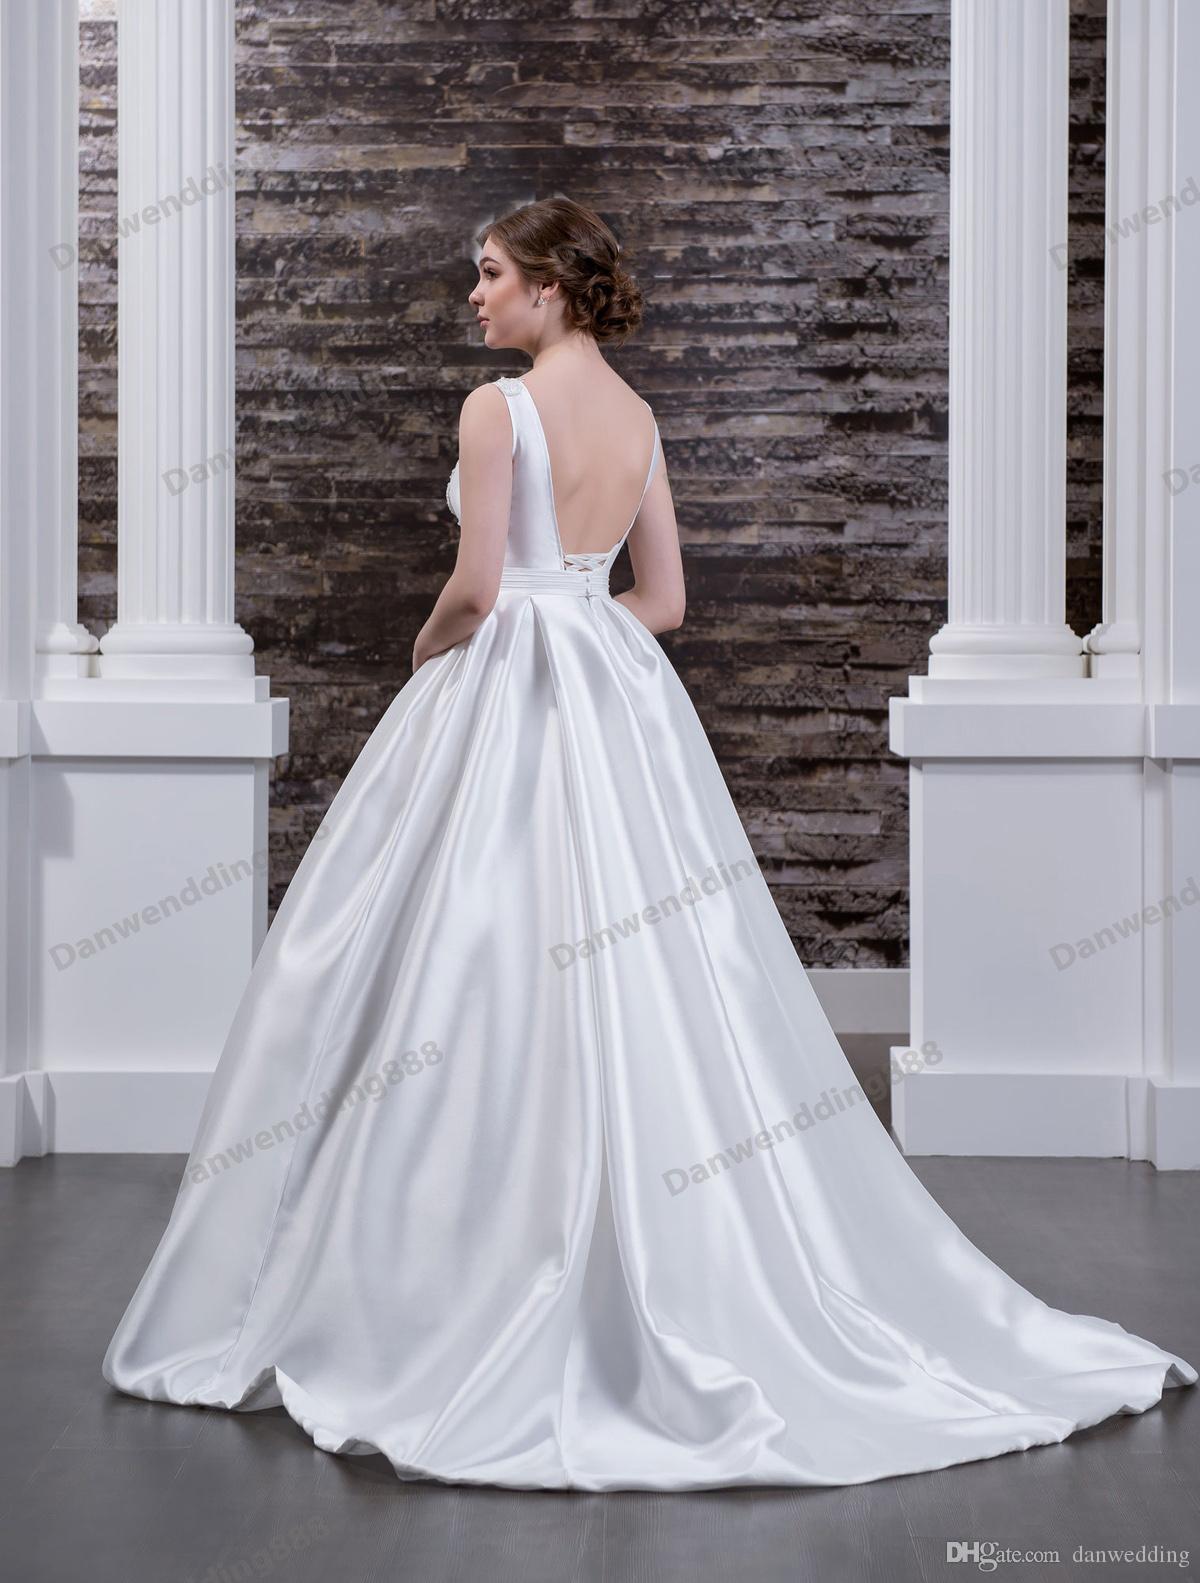 Charming White Satin Backless Applique Beads A-Line Wedding Dresses Bridal Pageant Dresses Wedding Attire Dresses Custom Size 2-16 ZW608065